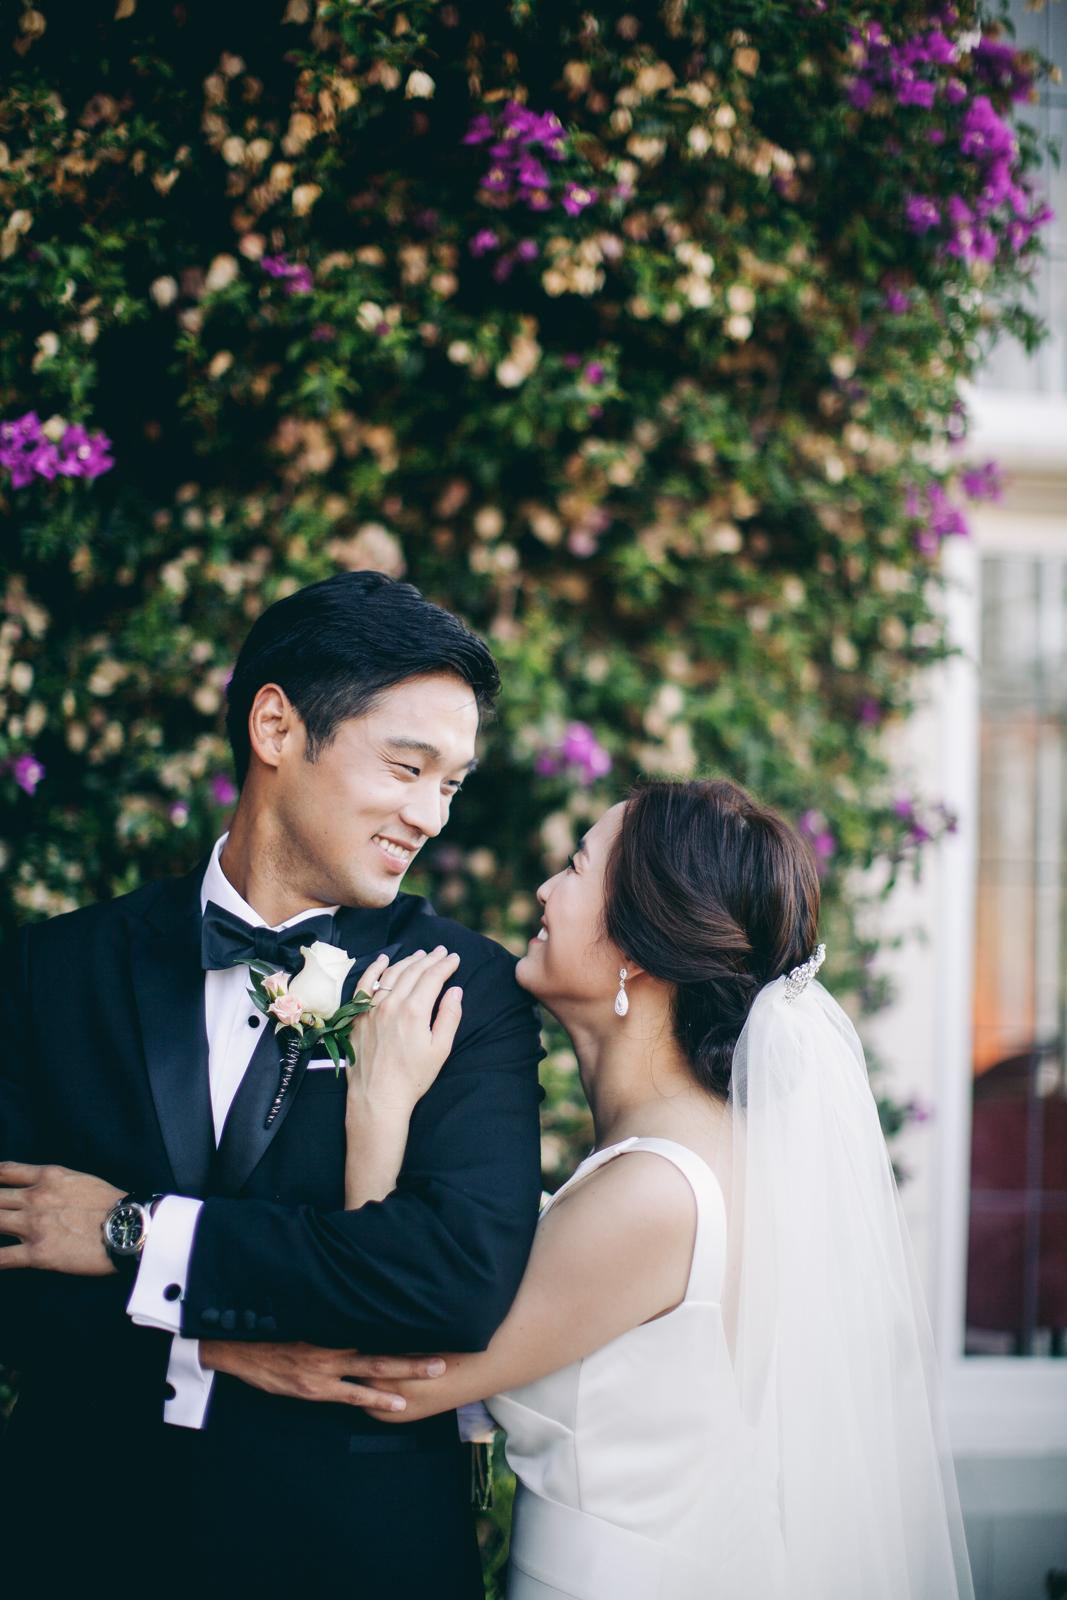 kohl_manison_wedding_photography_sarah_eric_ebony_siovhan_bokeh_photography_028.jpg